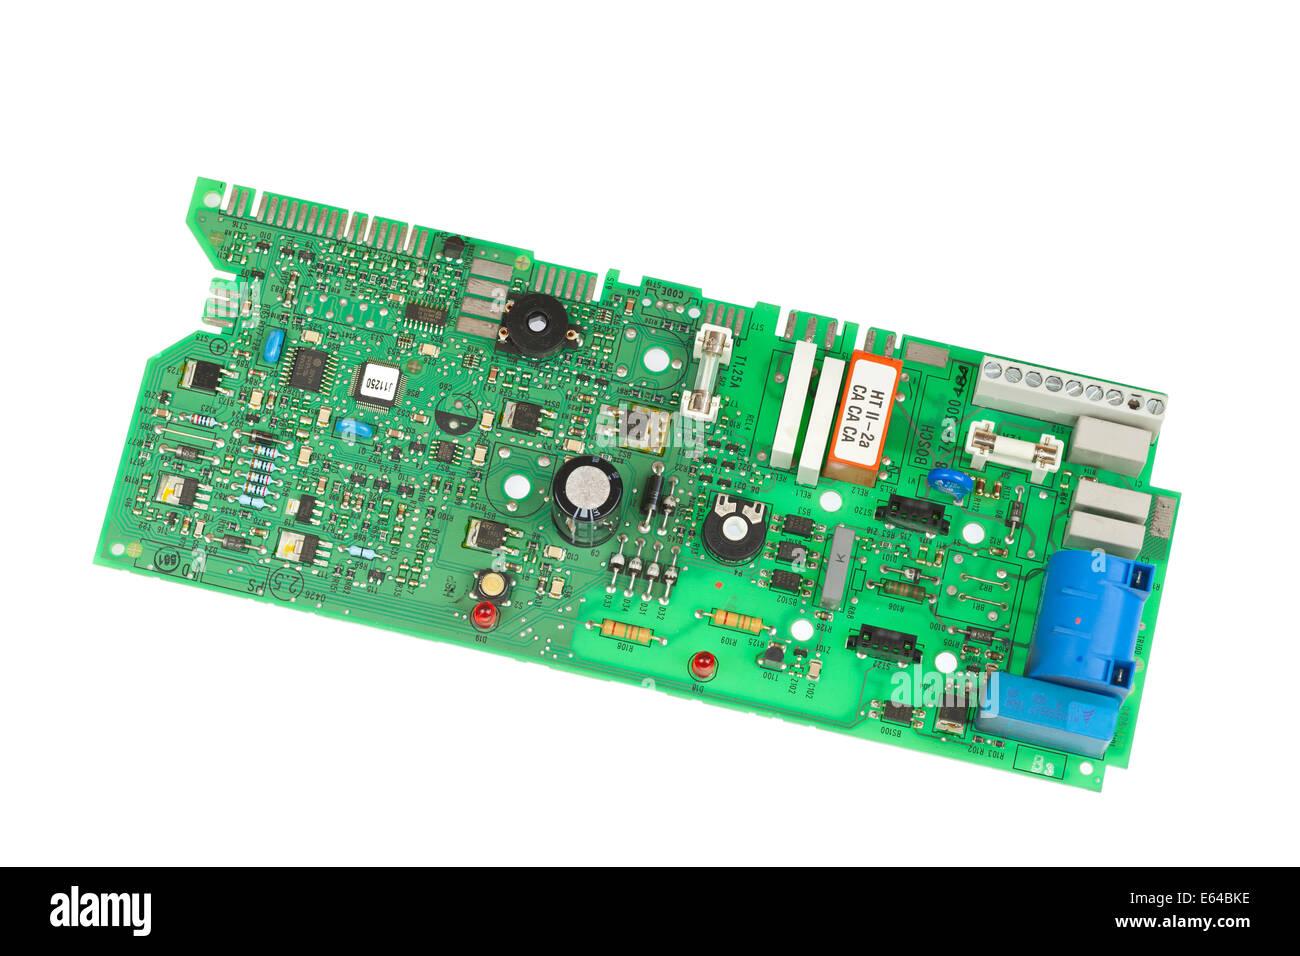 Electrical circuit board - Stock Image